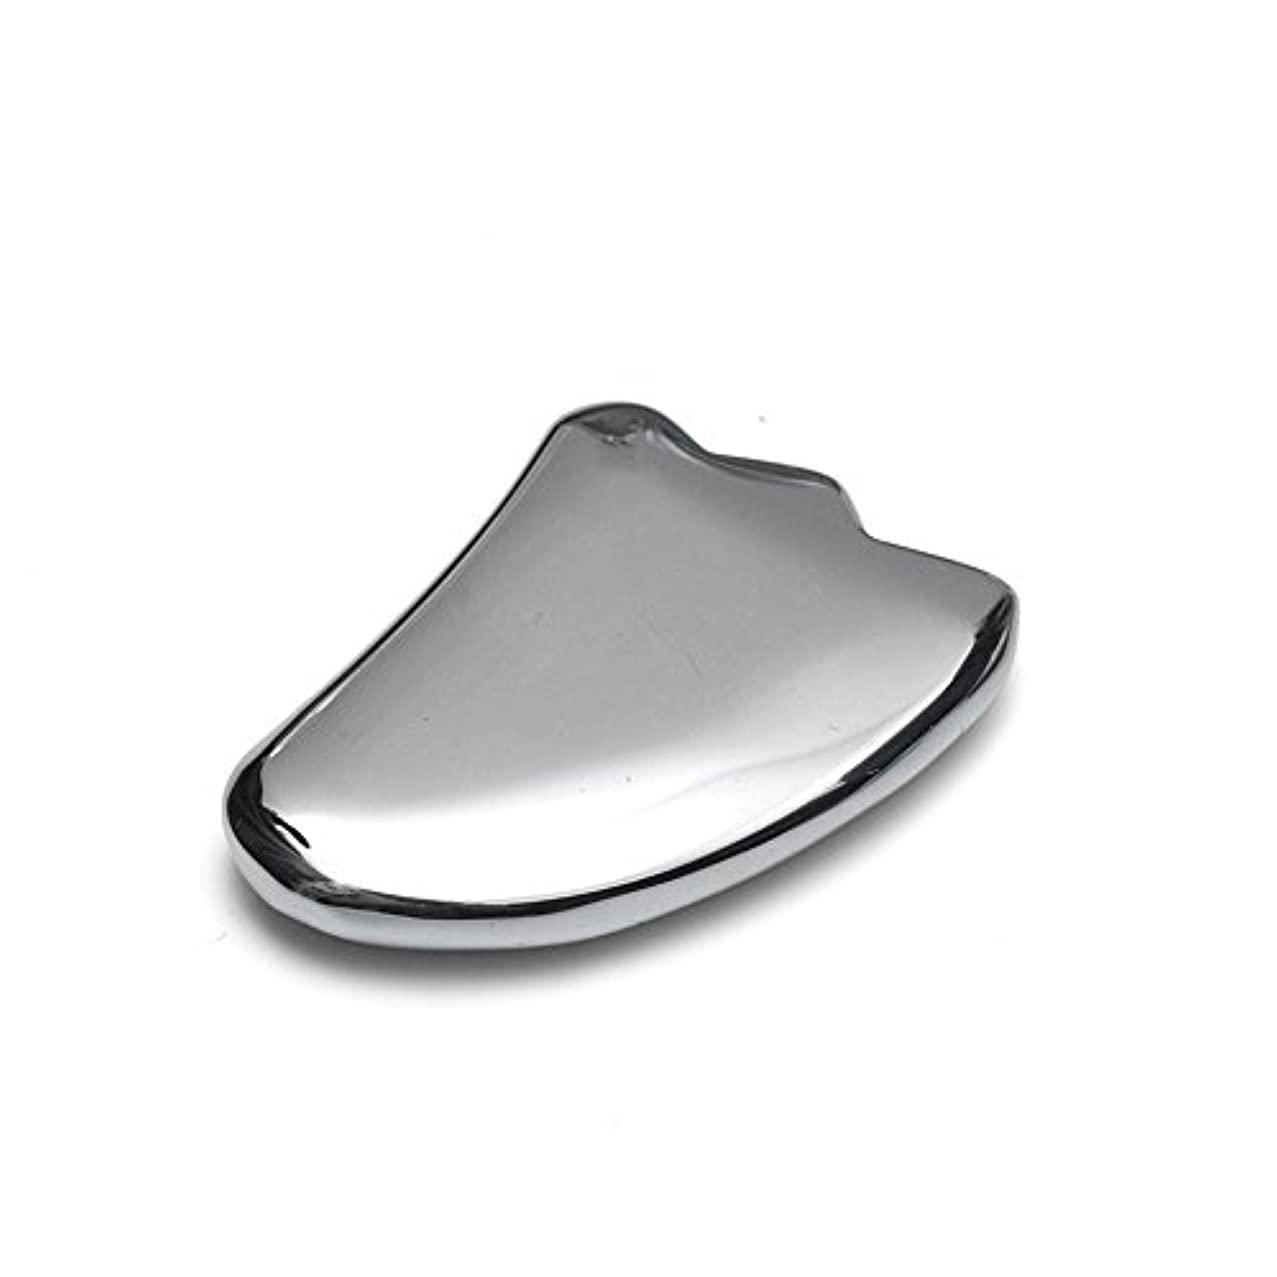 【OVER-9】 テラヘルツ鉱石 かっさ プレート 羽根型 40mm 美顔器 美容 フェイス 原石 超遠赤外線 健康 カッサ マッサージ